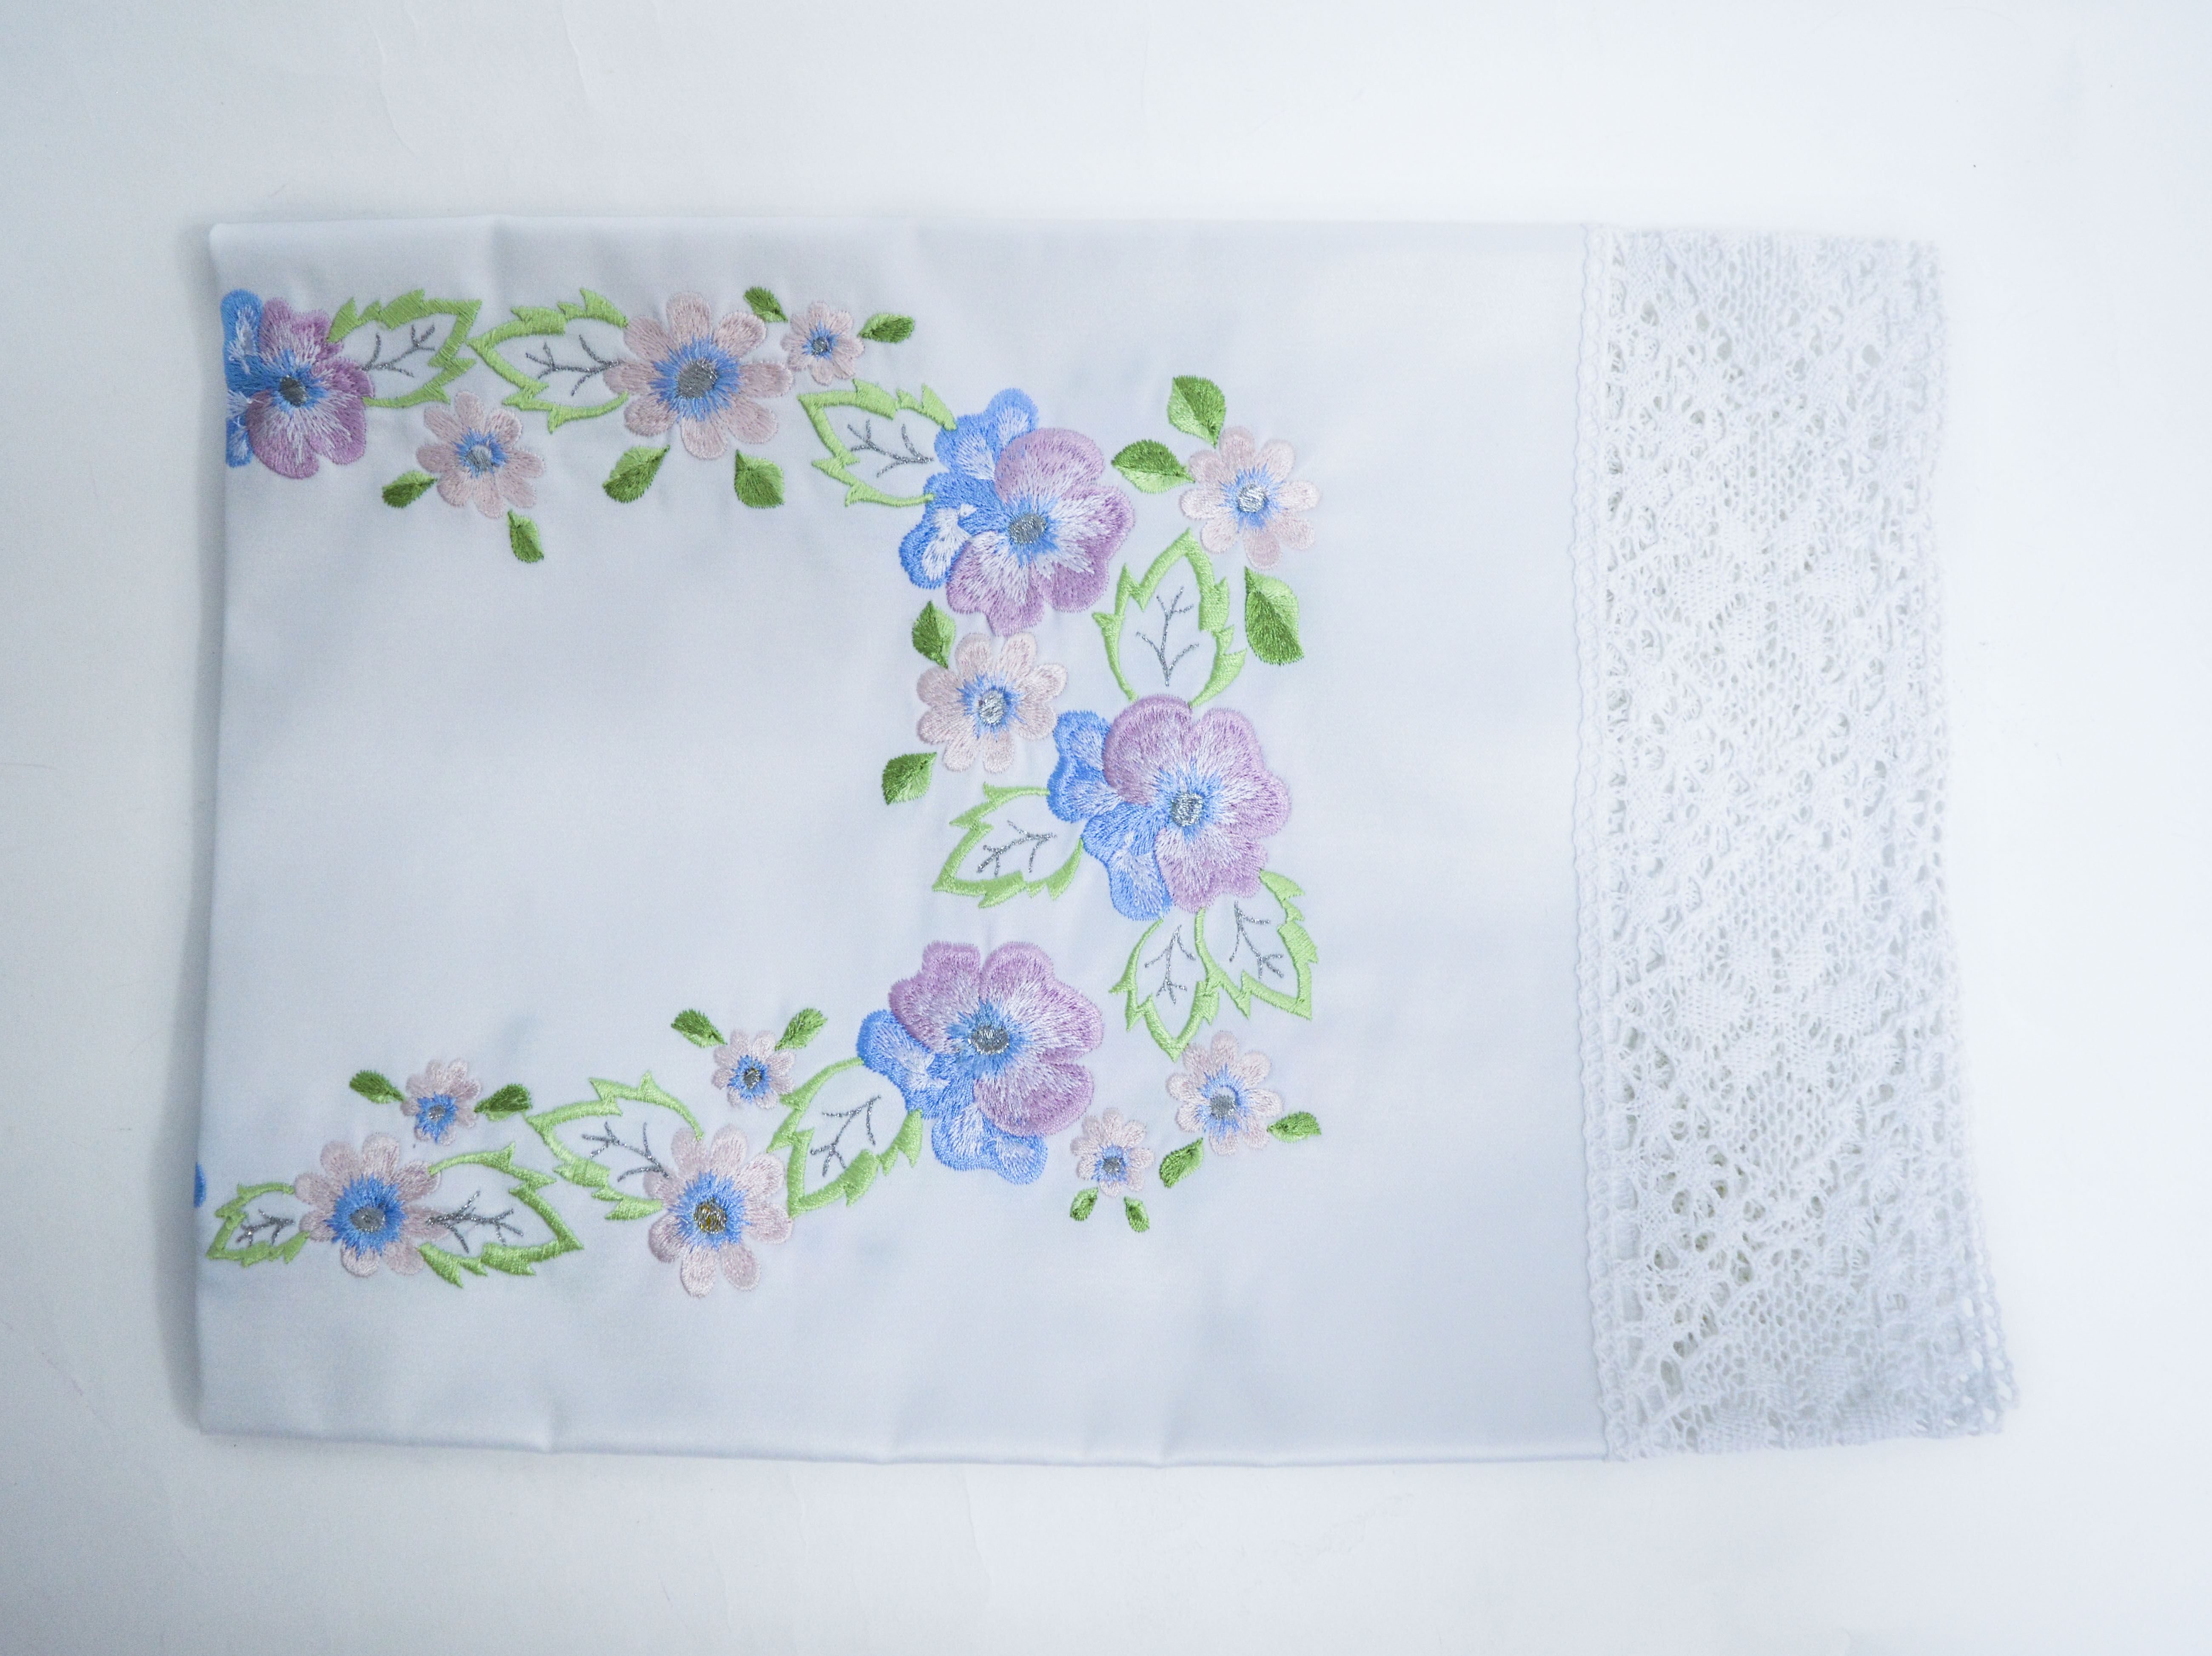 Салфетка с вышивкой арт. 19с-190-224